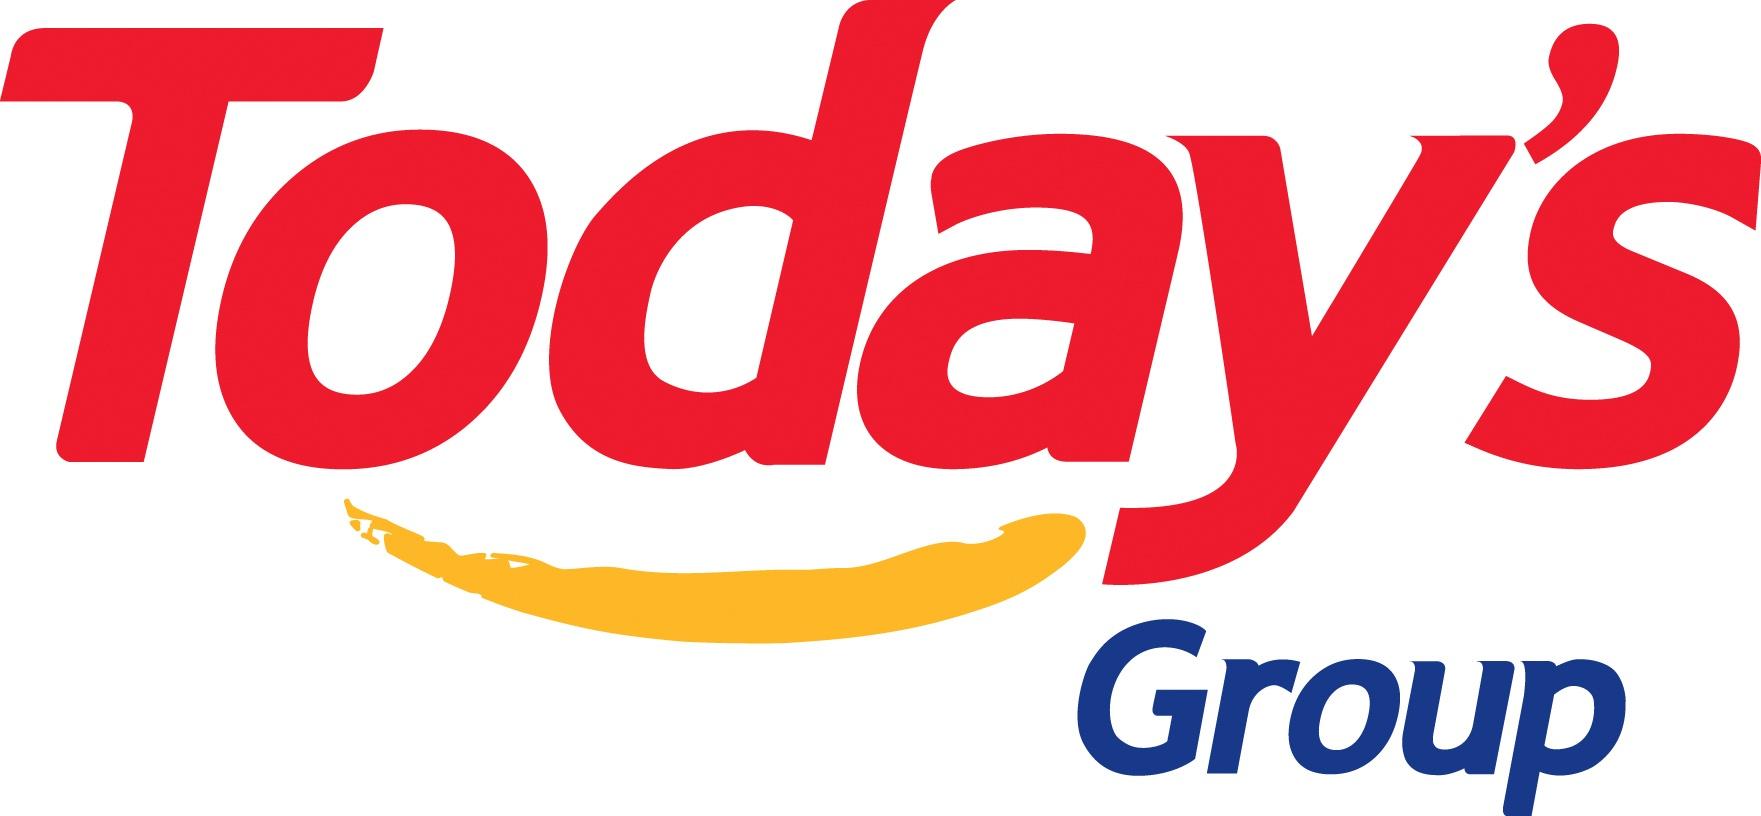 Todays Group master logo.jpg